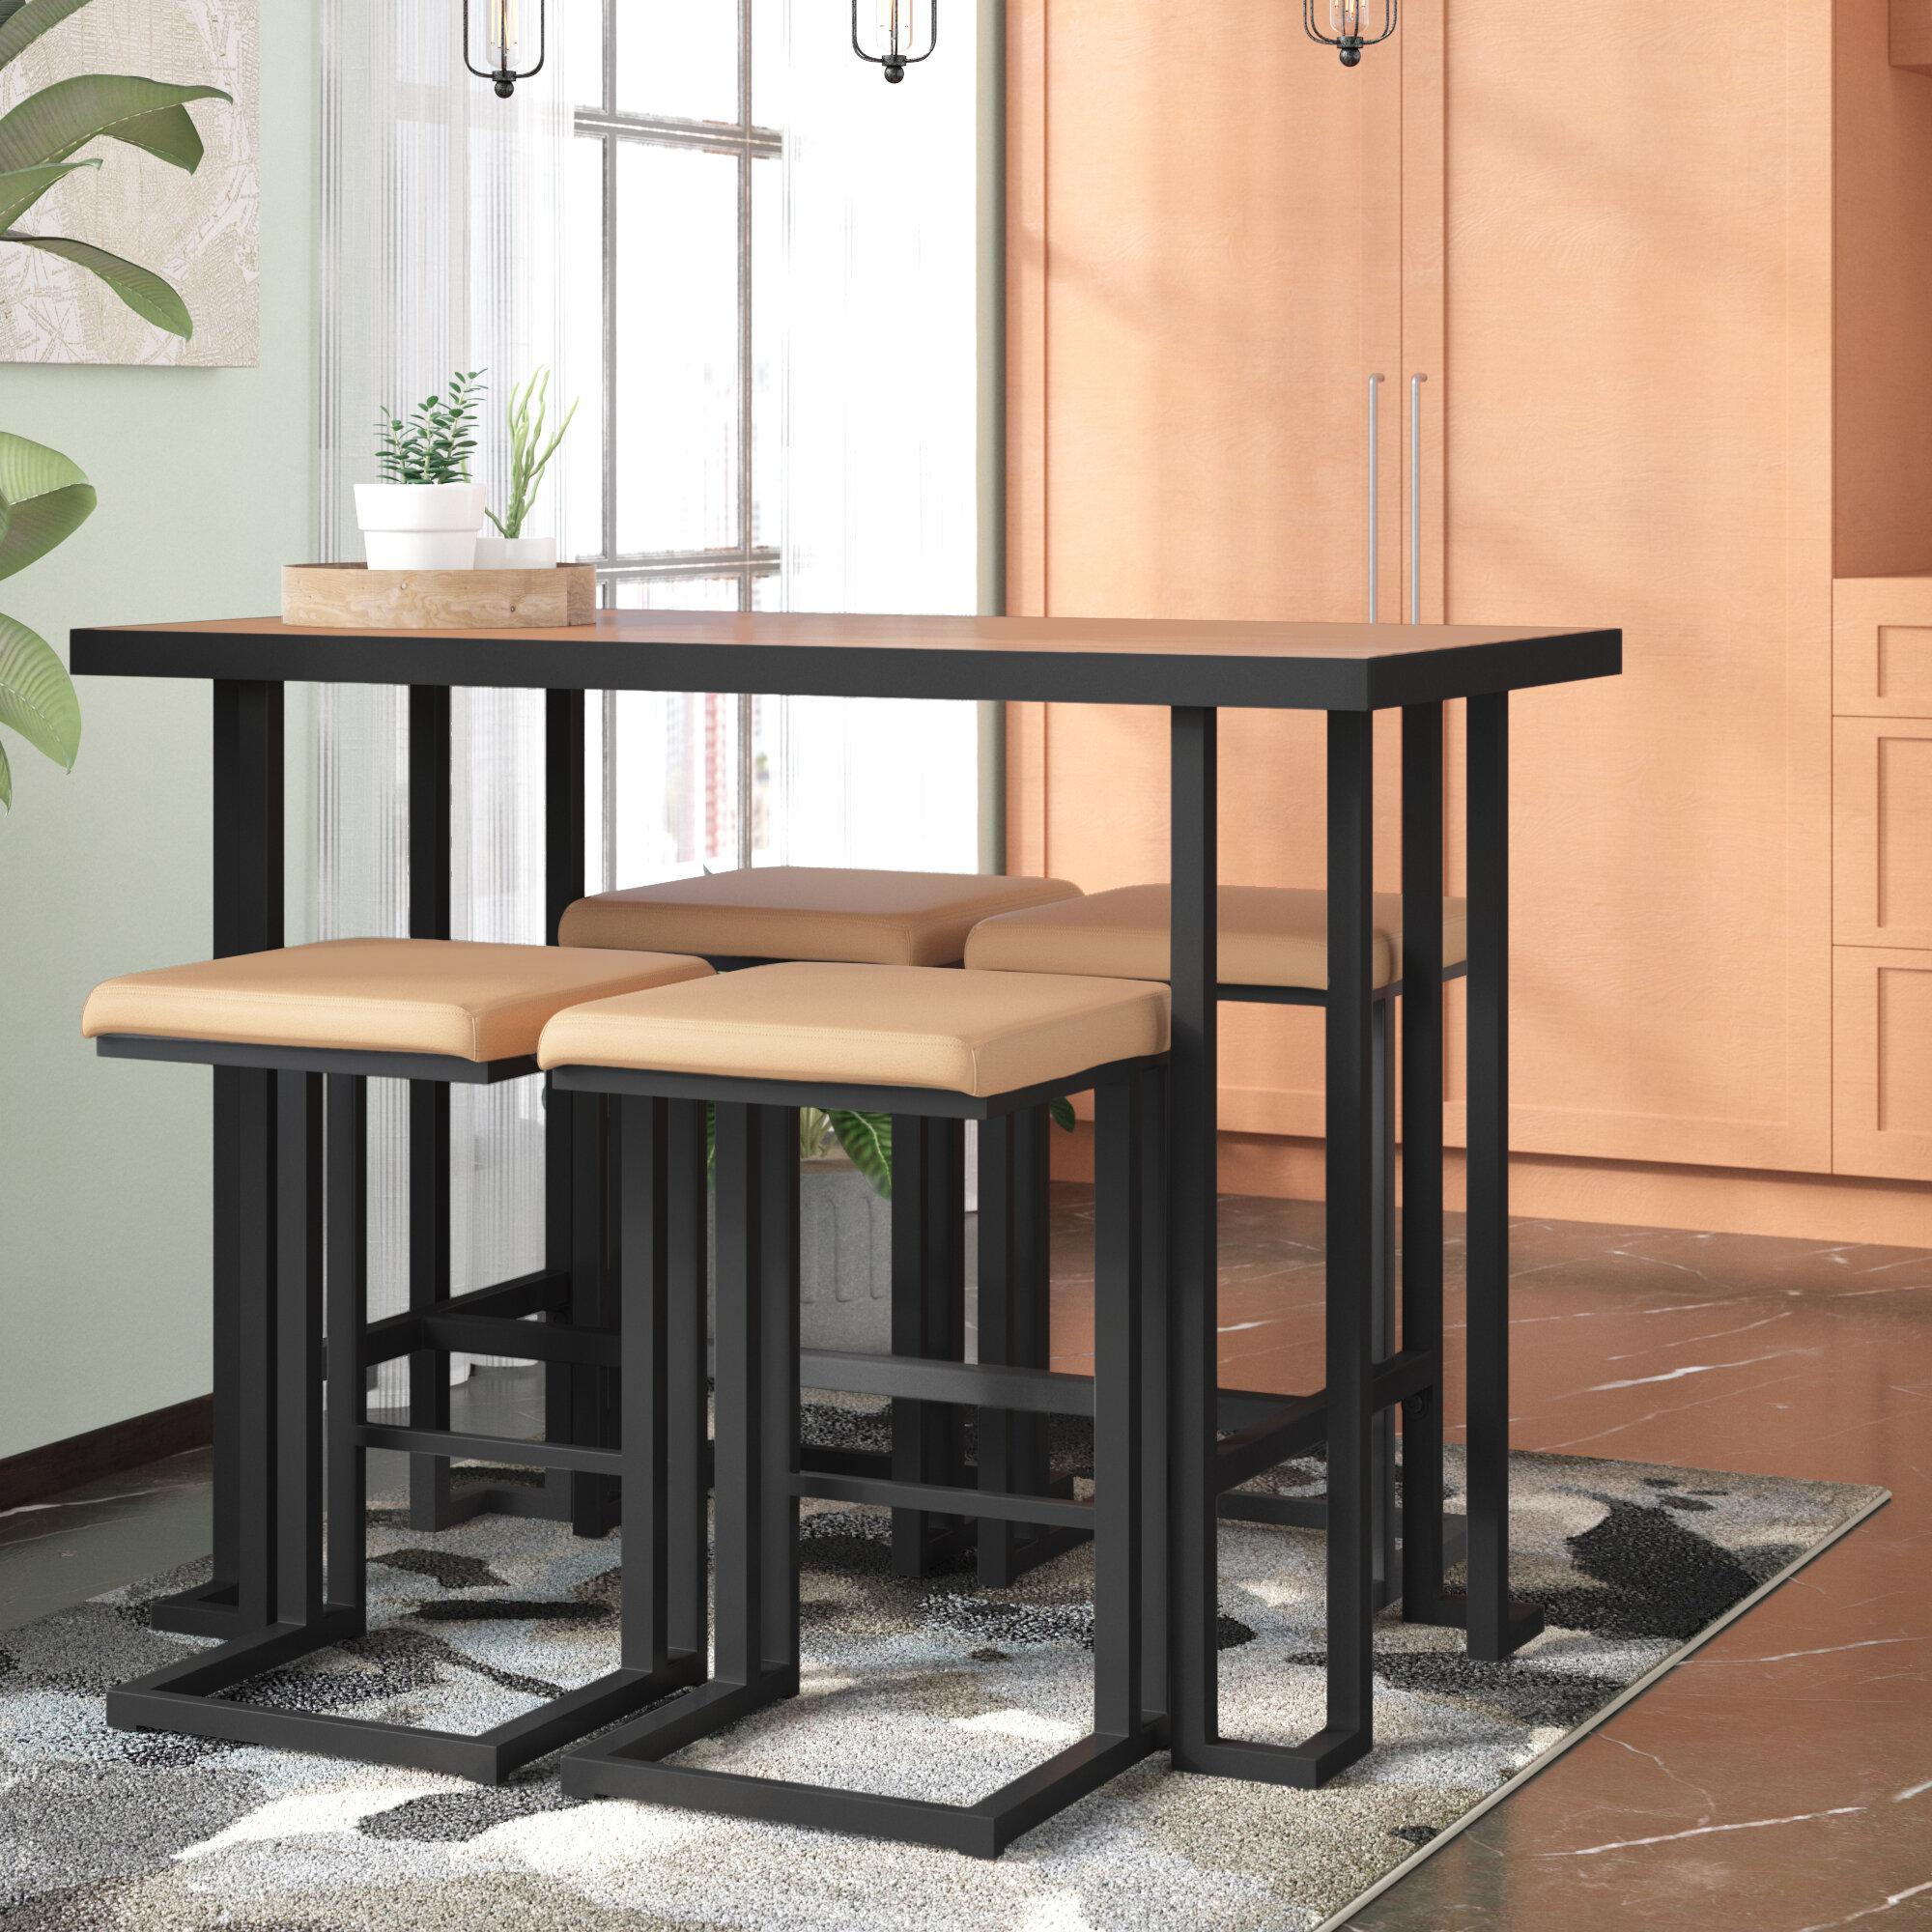 Excellent Calistoga 5 Piece Counter Height Dining Set Machost Co Dining Chair Design Ideas Machostcouk